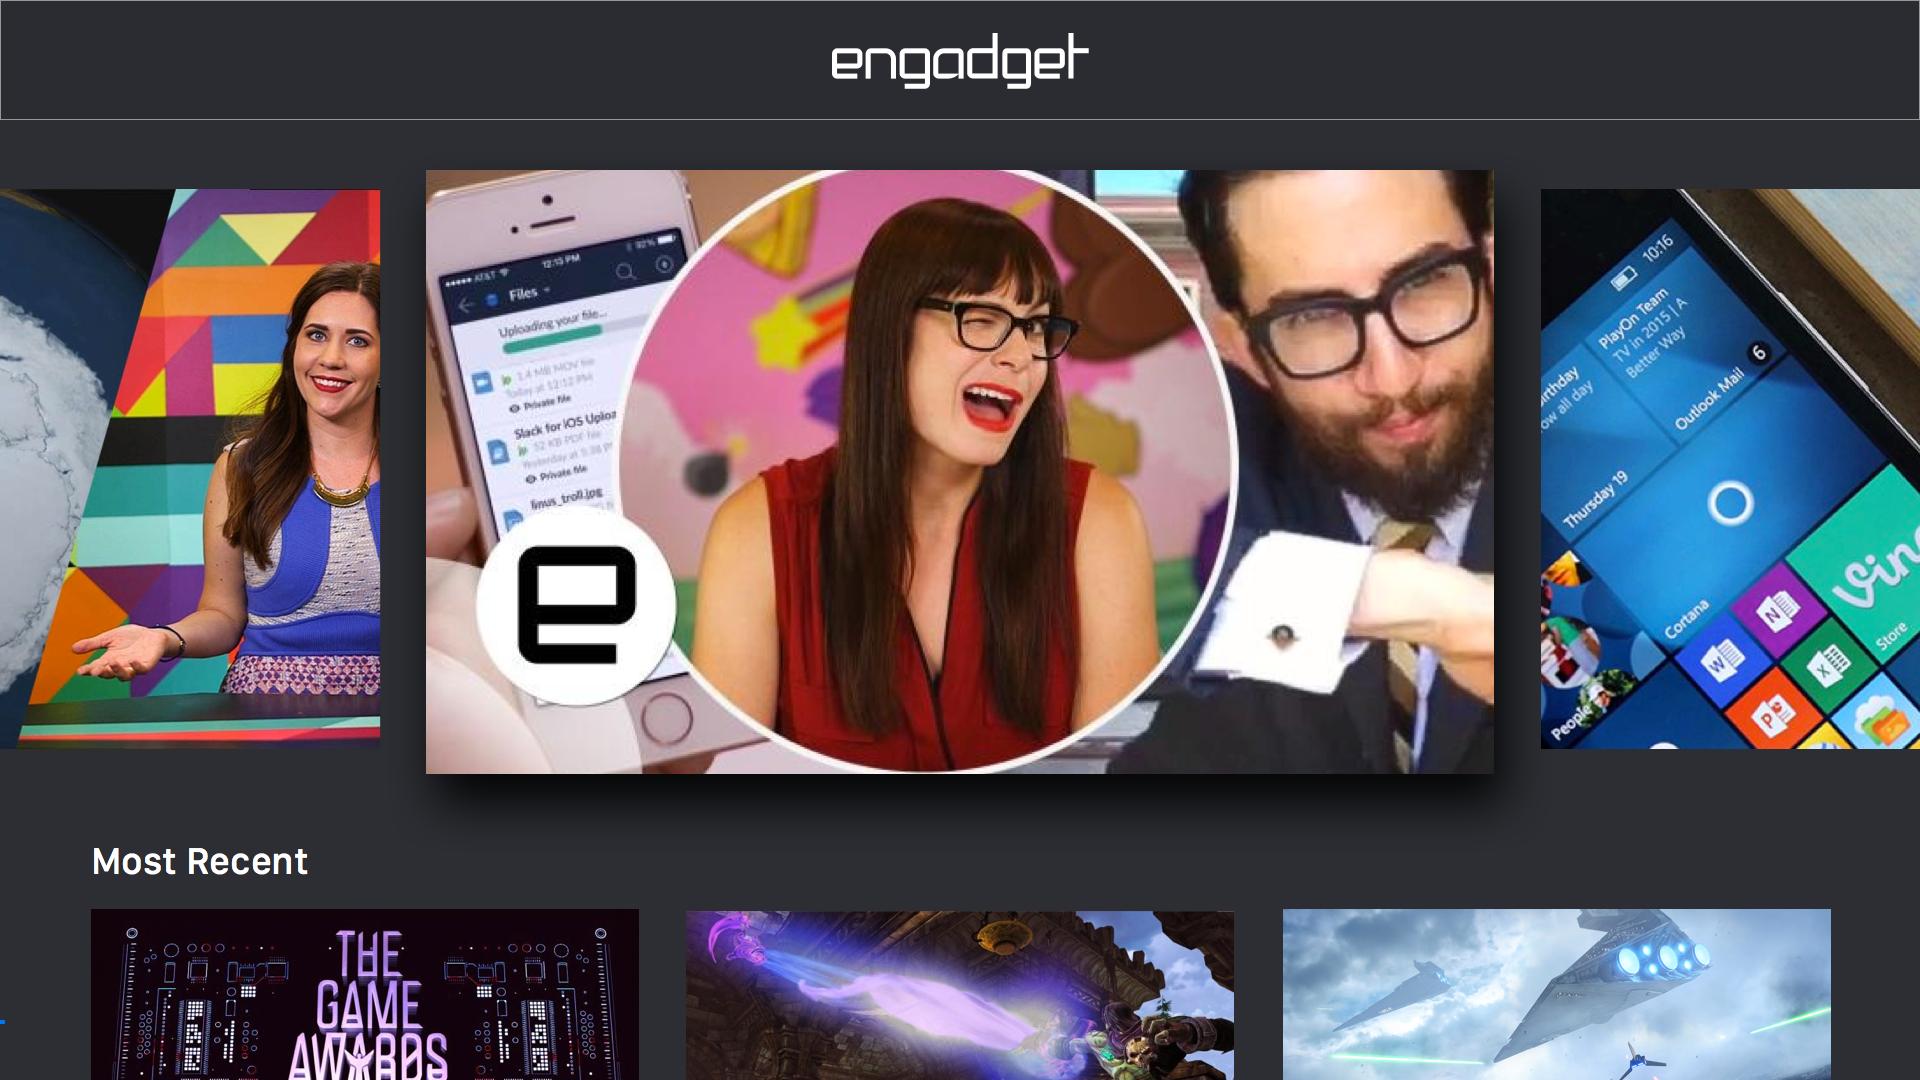 Engadget screenshot 2